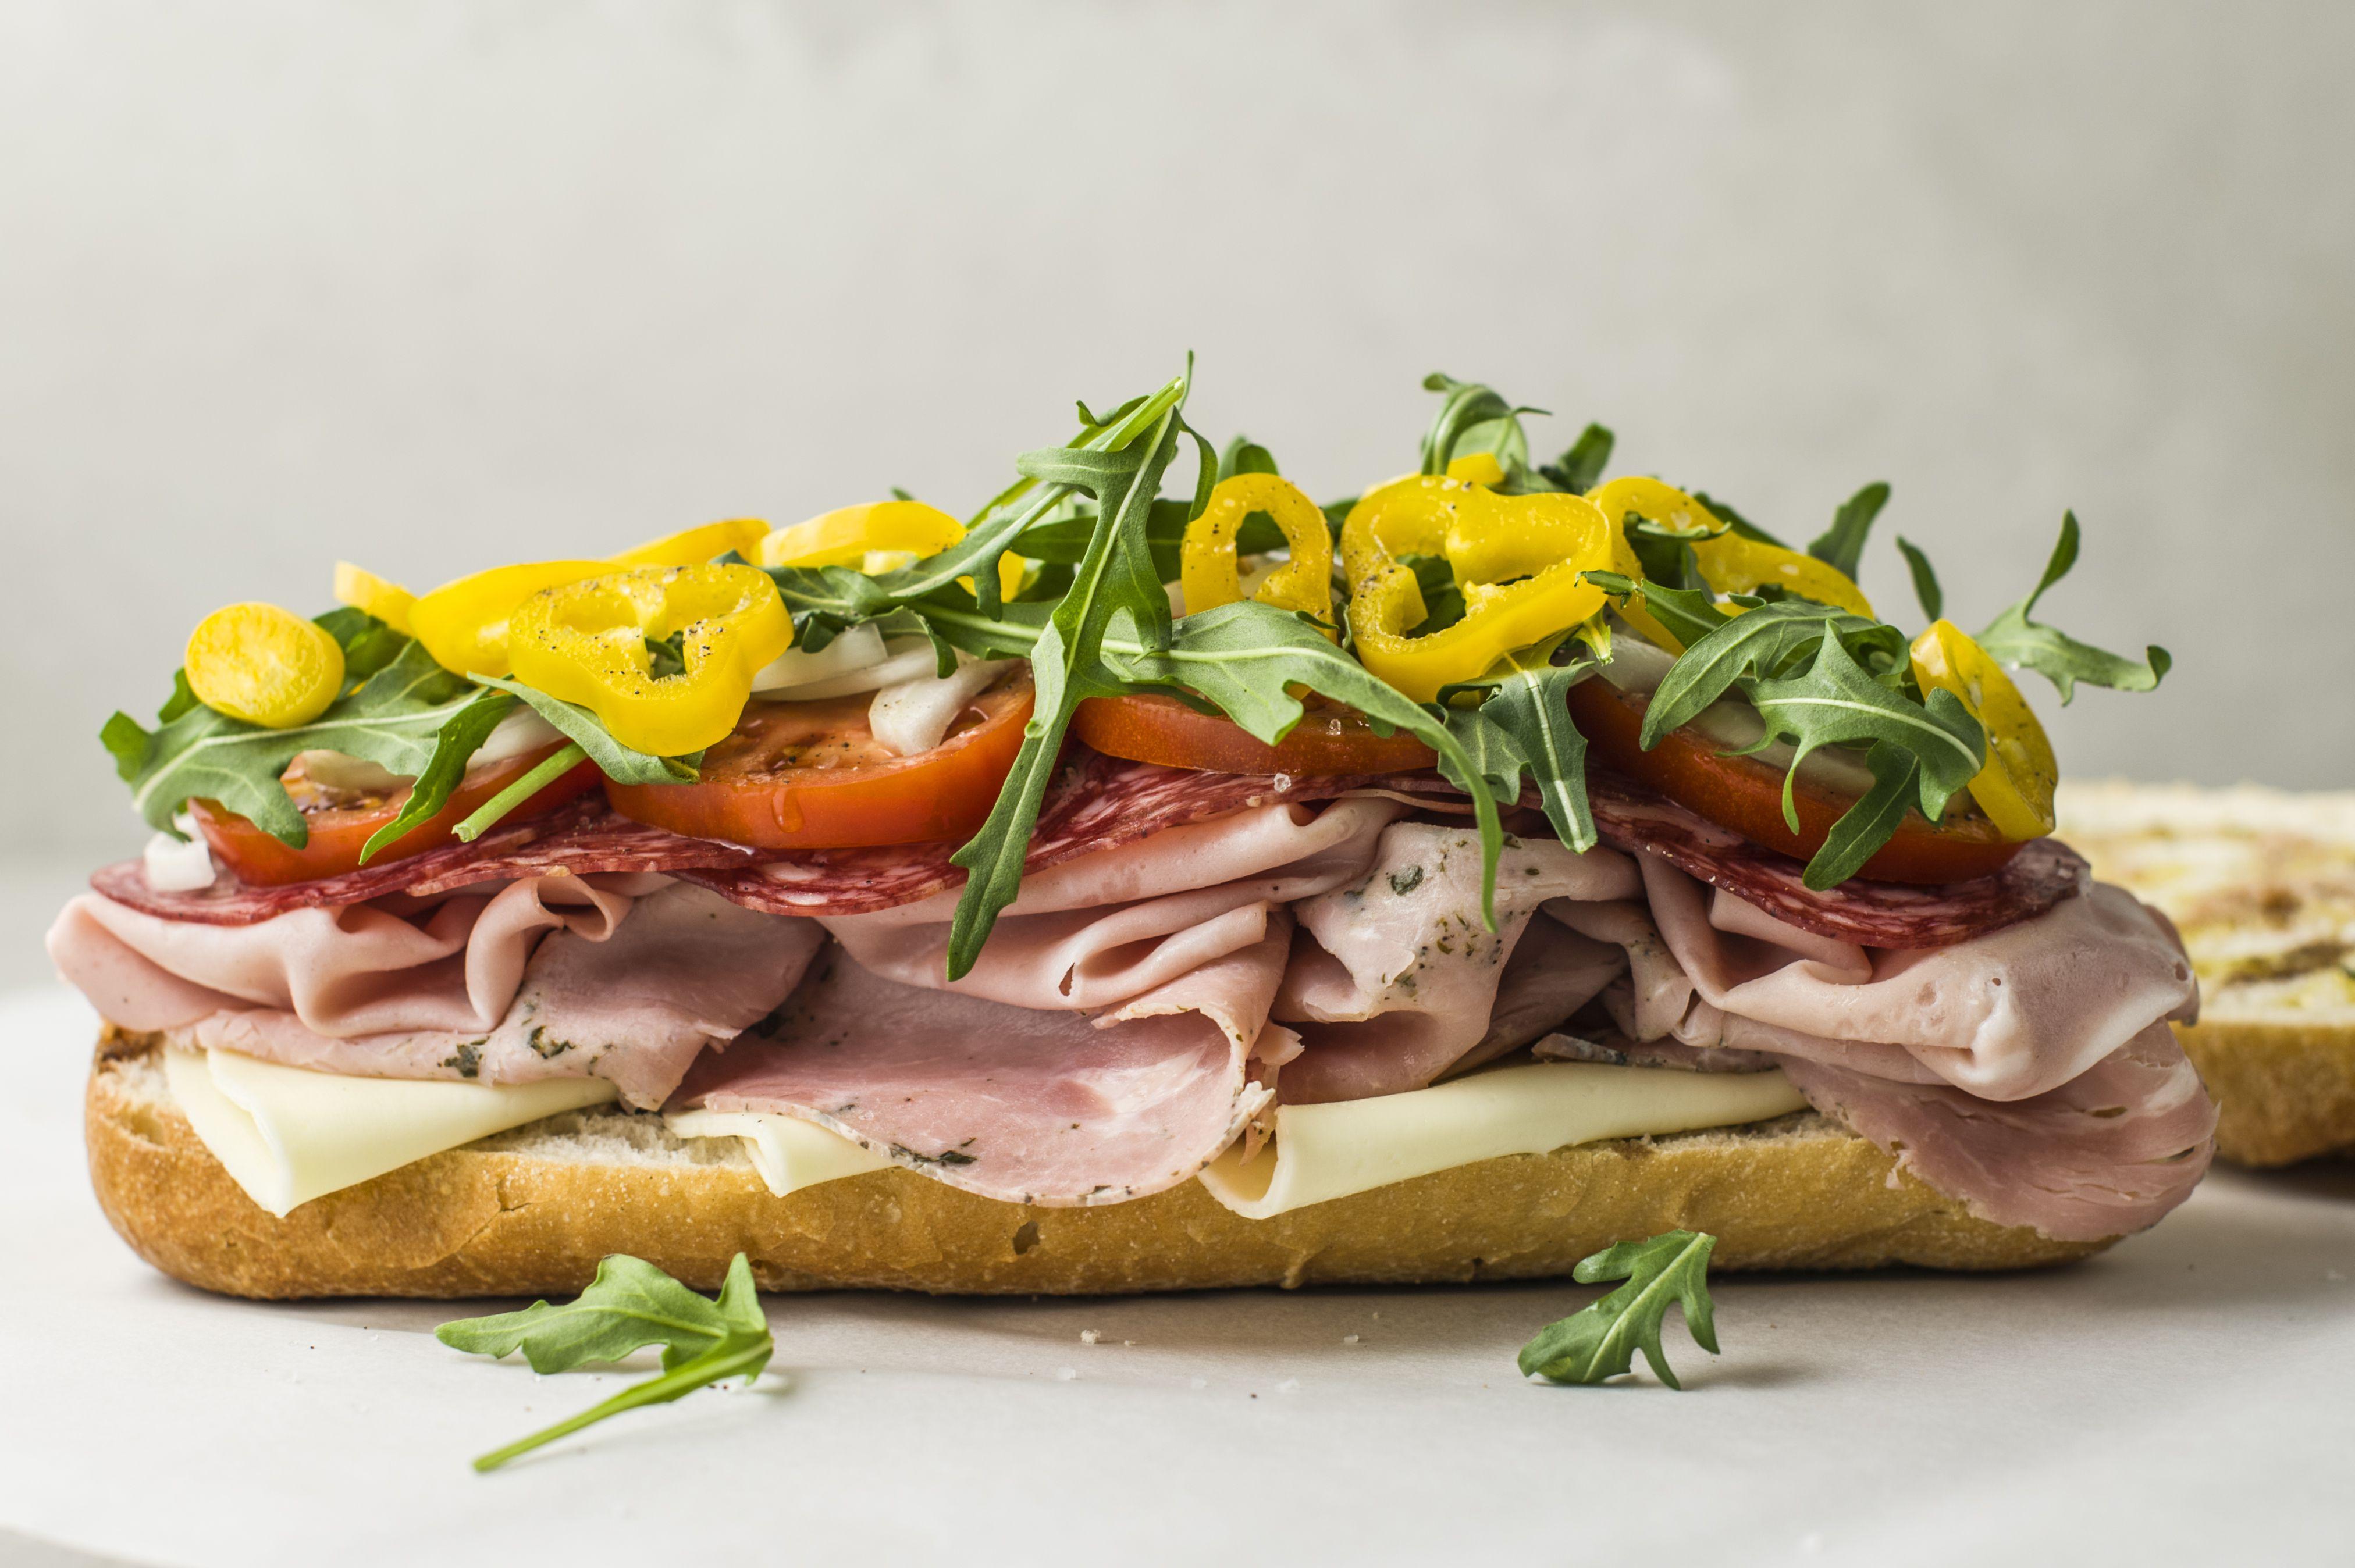 add provolone, ham, mortadella, soppressata, tomatoes, onion, lettuce, banana peppers, salt, and pepper